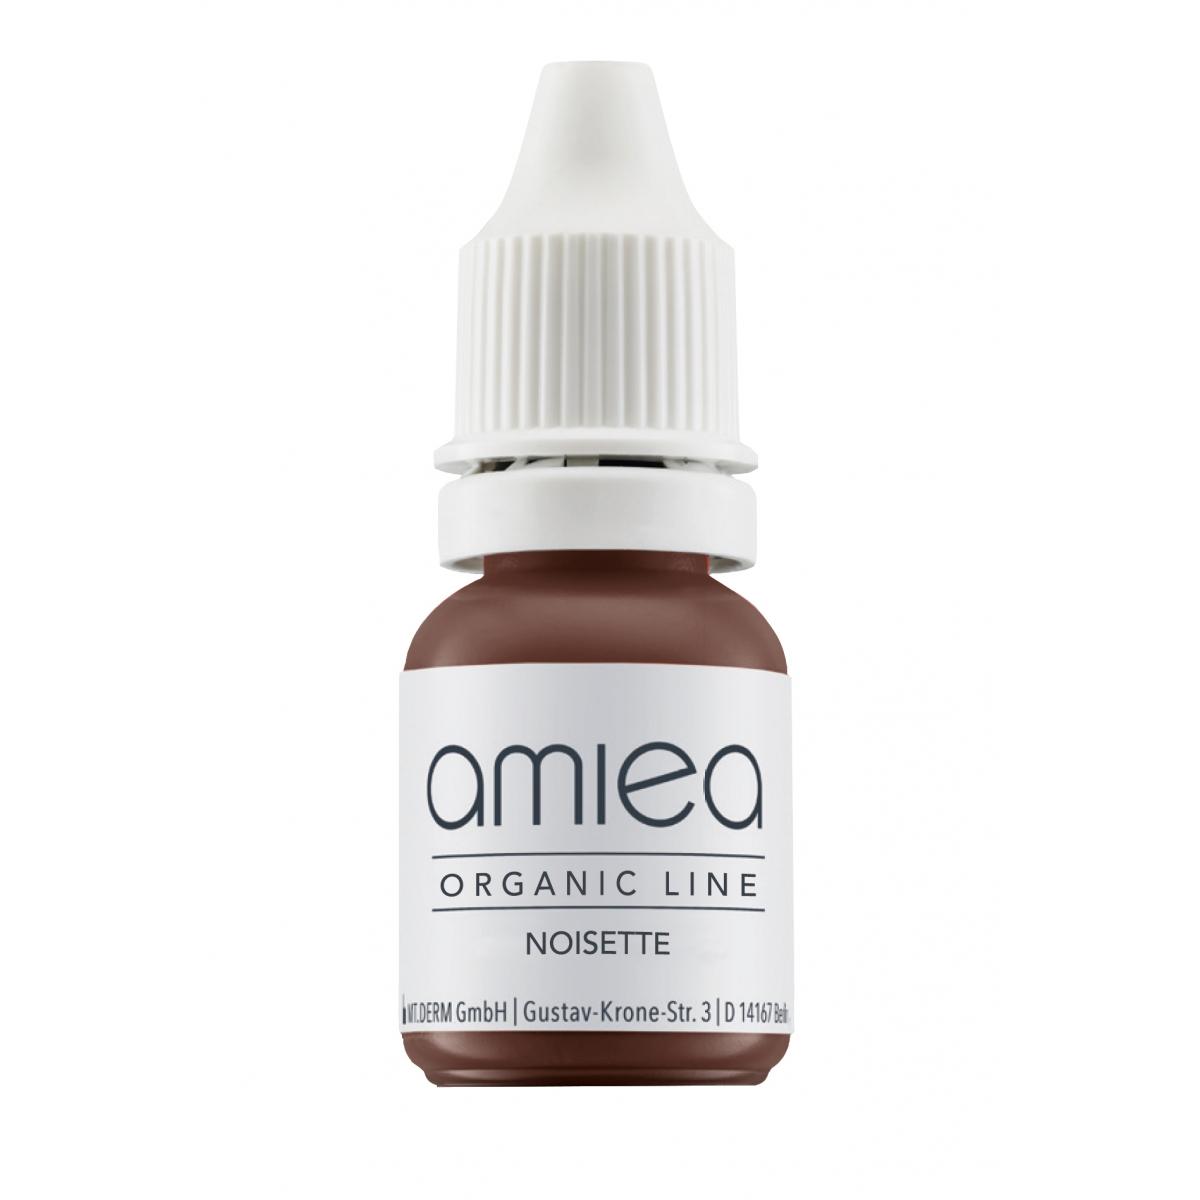 Organicline (10 ml) - PIGMENTS AMIEA ORGANICLINE NOISETTE, Flacon 10 ml